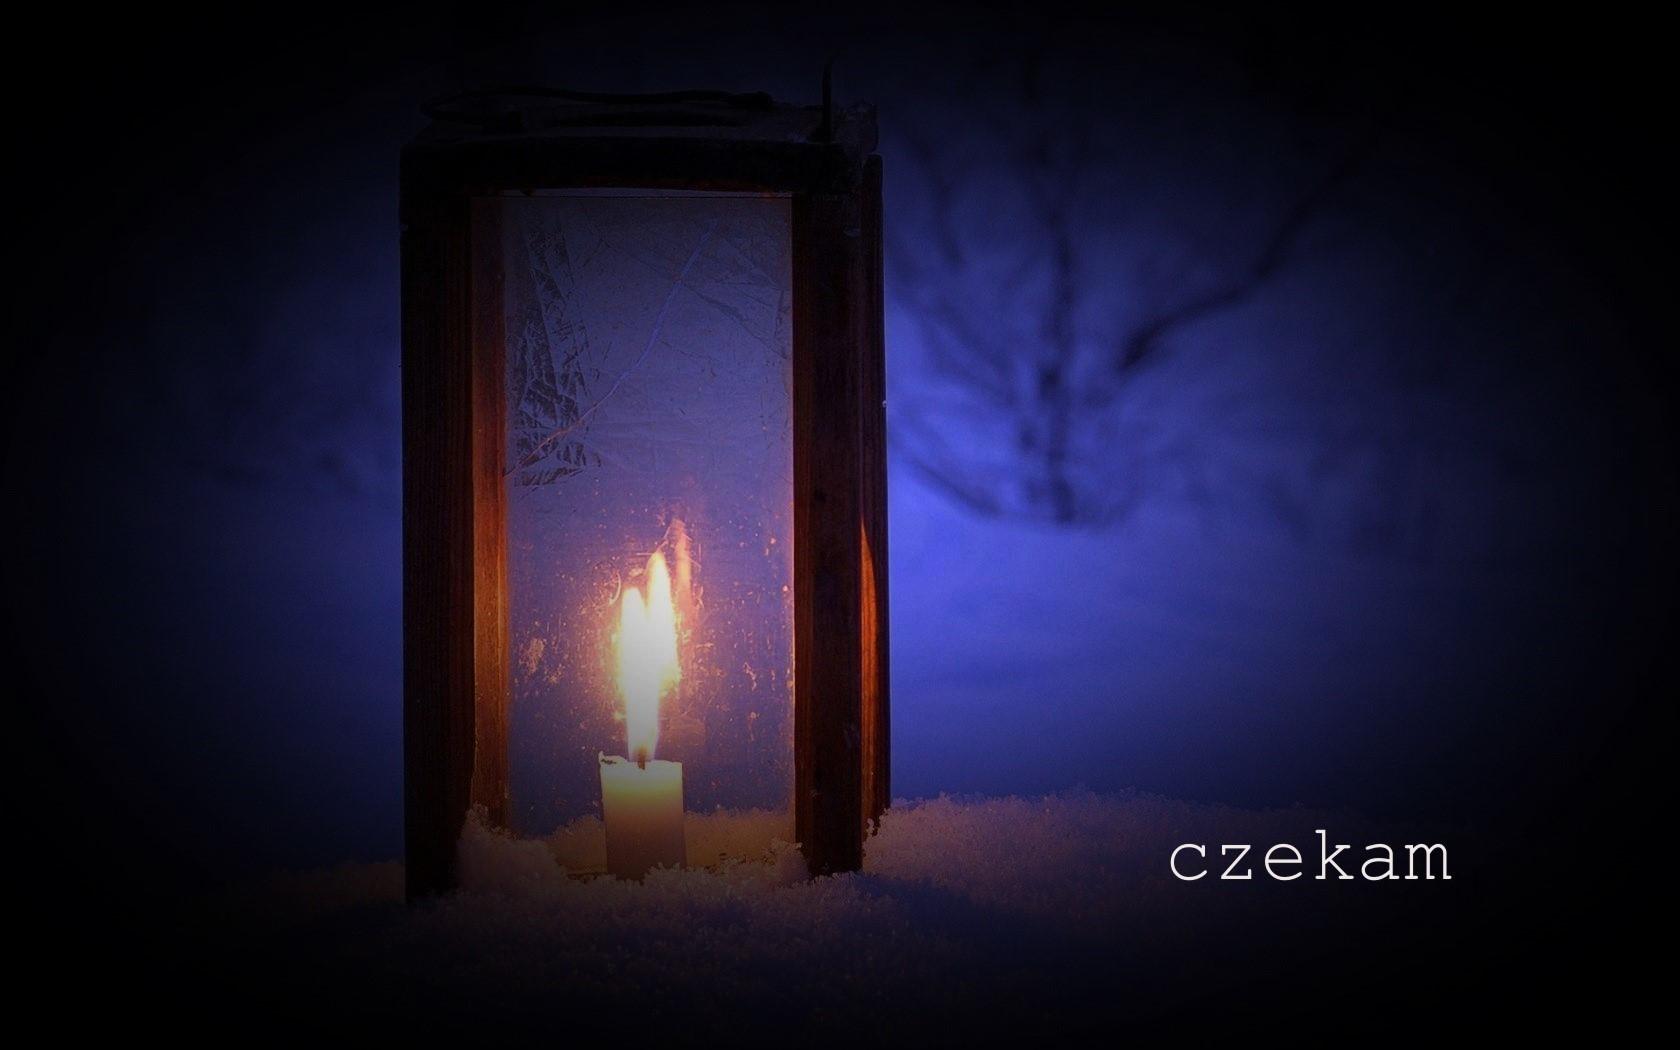 191467_zima_snieg_lampion_swieca_ogien